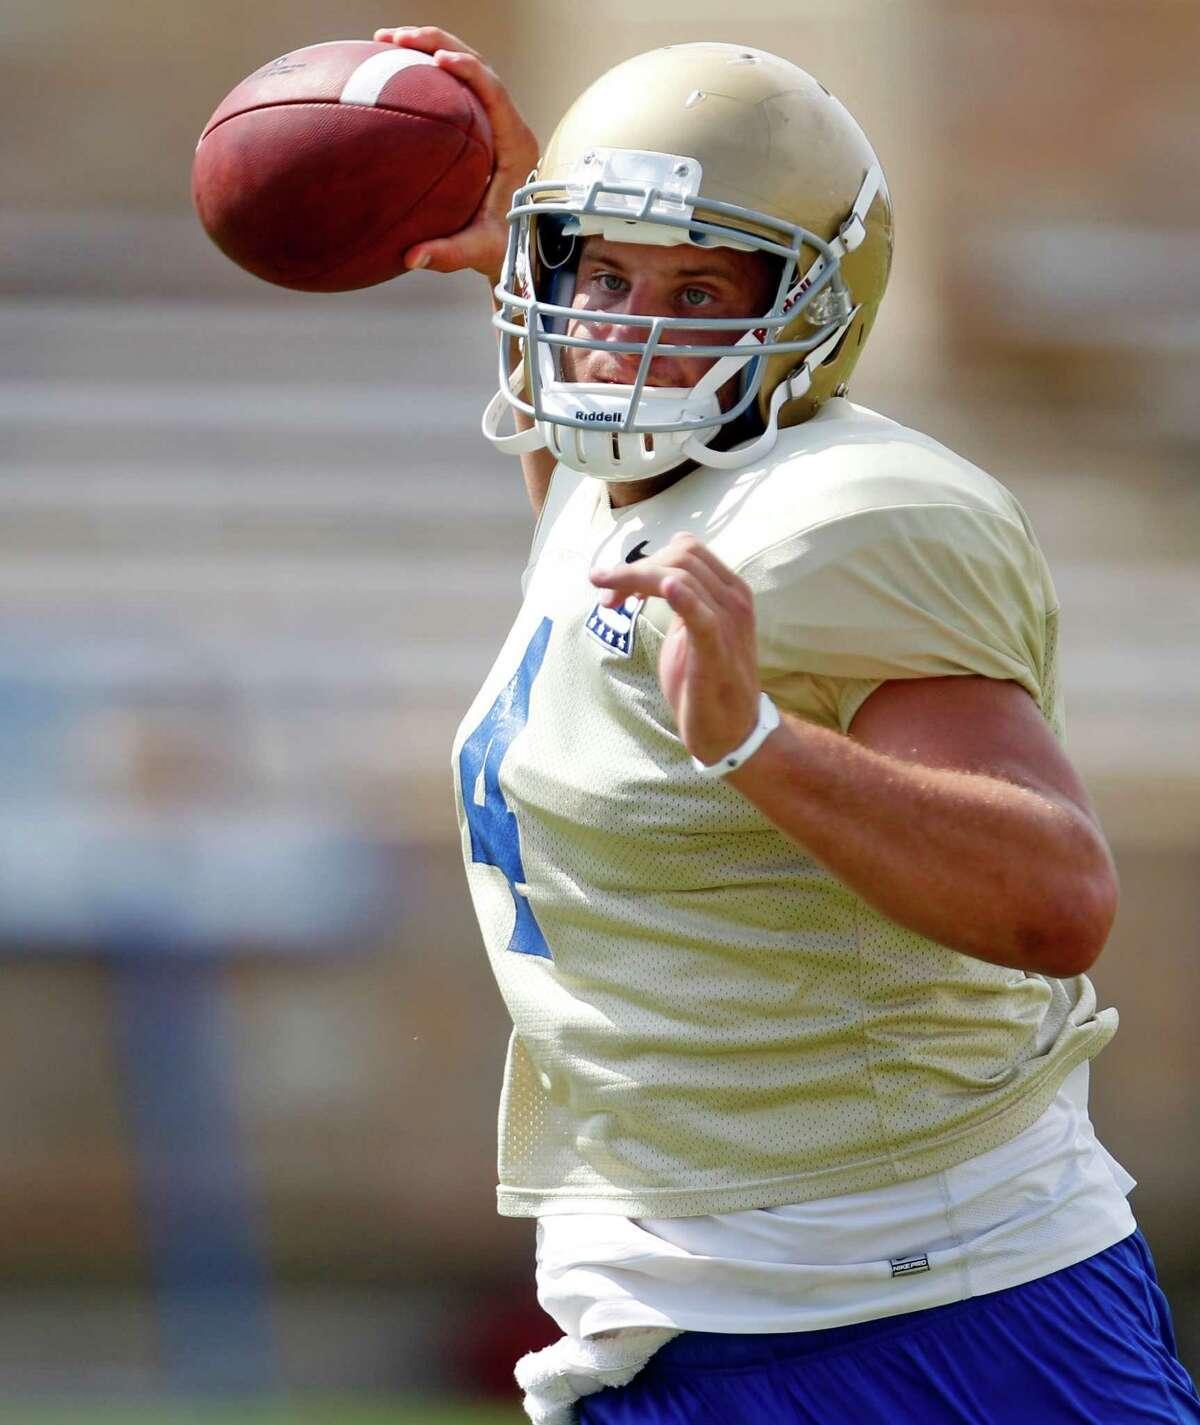 In this Wednesday, Aug 10, 2011 photo, Tulsa quarterback G.J. Kinne is pictured during a Tulsa football practice in Tulsa, Okla. (AP Photo/Sue Ogrocki)